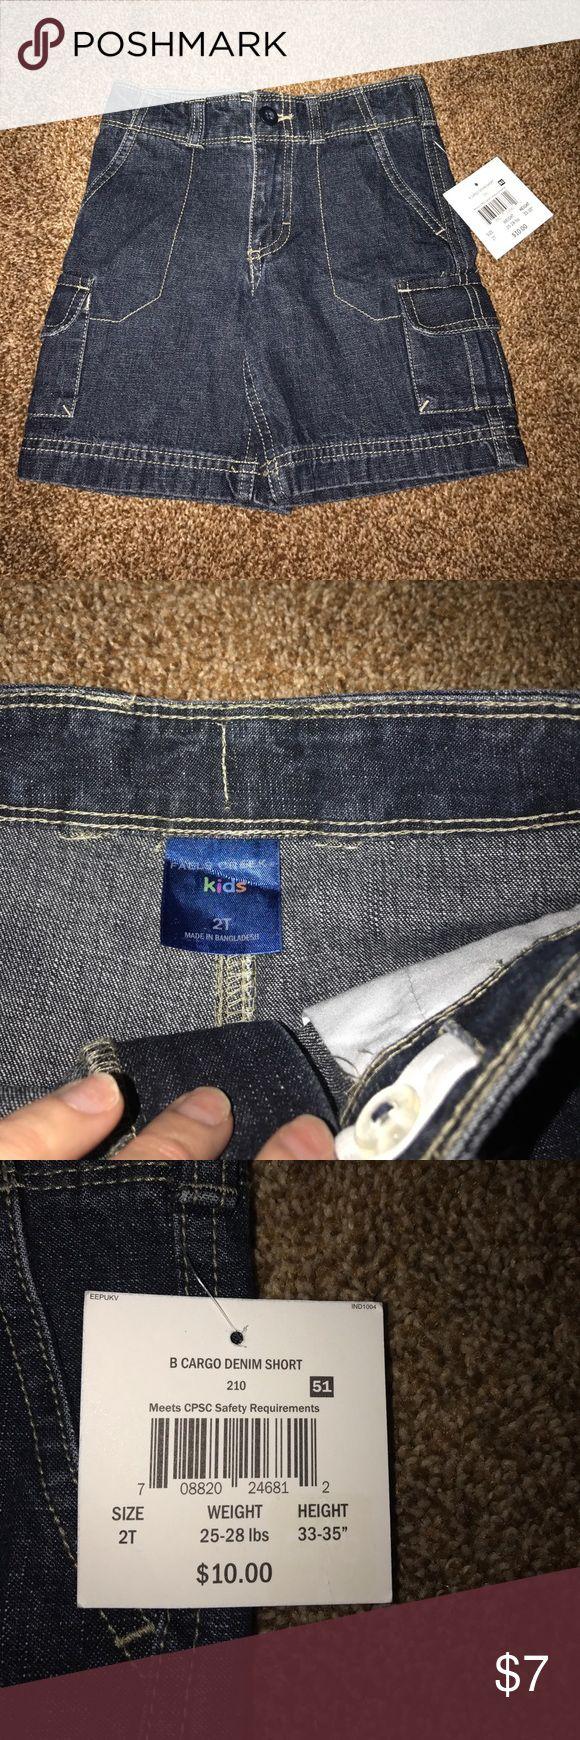 Falls creek Jean shorts Little boy size 2t jean shorts. New with tags. Original price 10.00 falls creek Bottoms Shorts